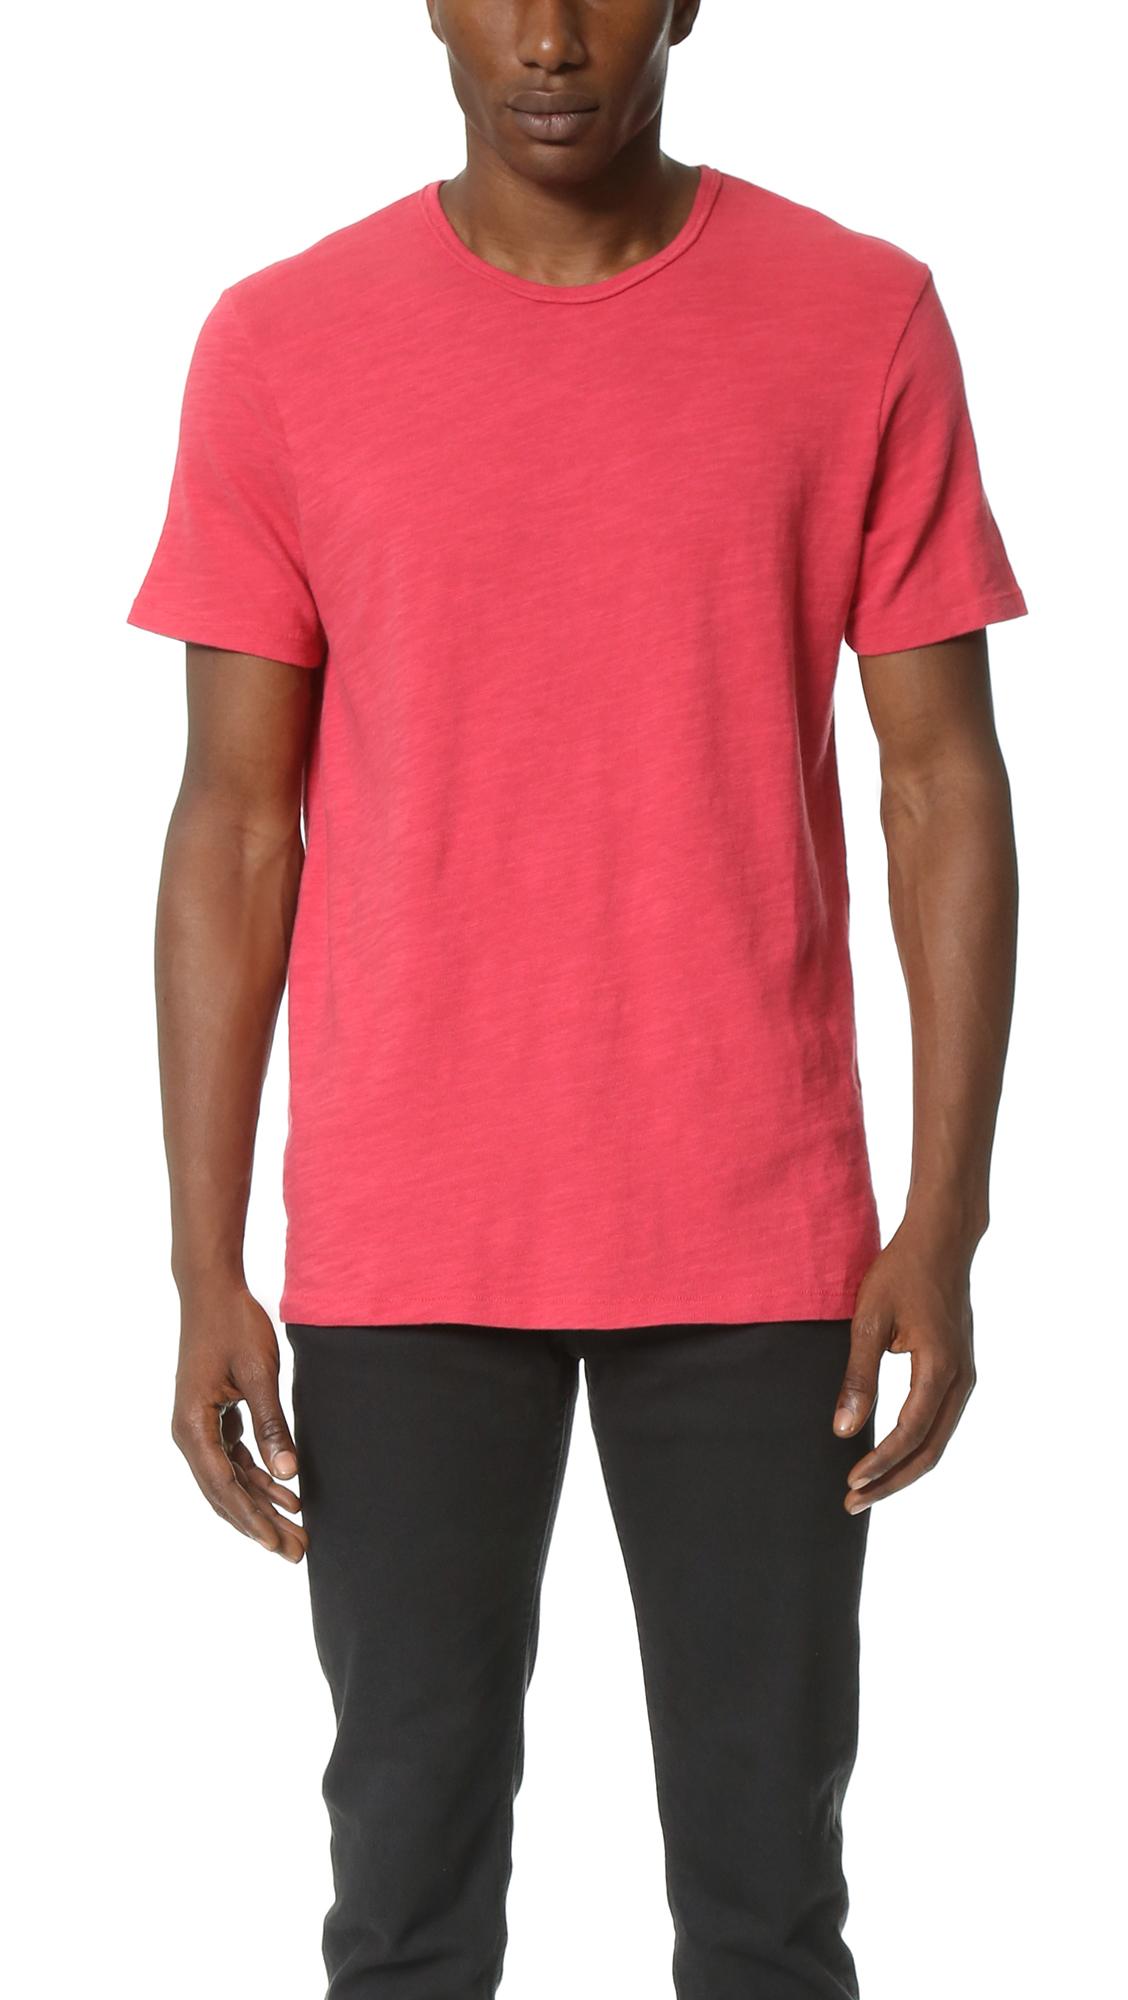 Rag Bone Basic T Shirt In Red For Men Vintage Red